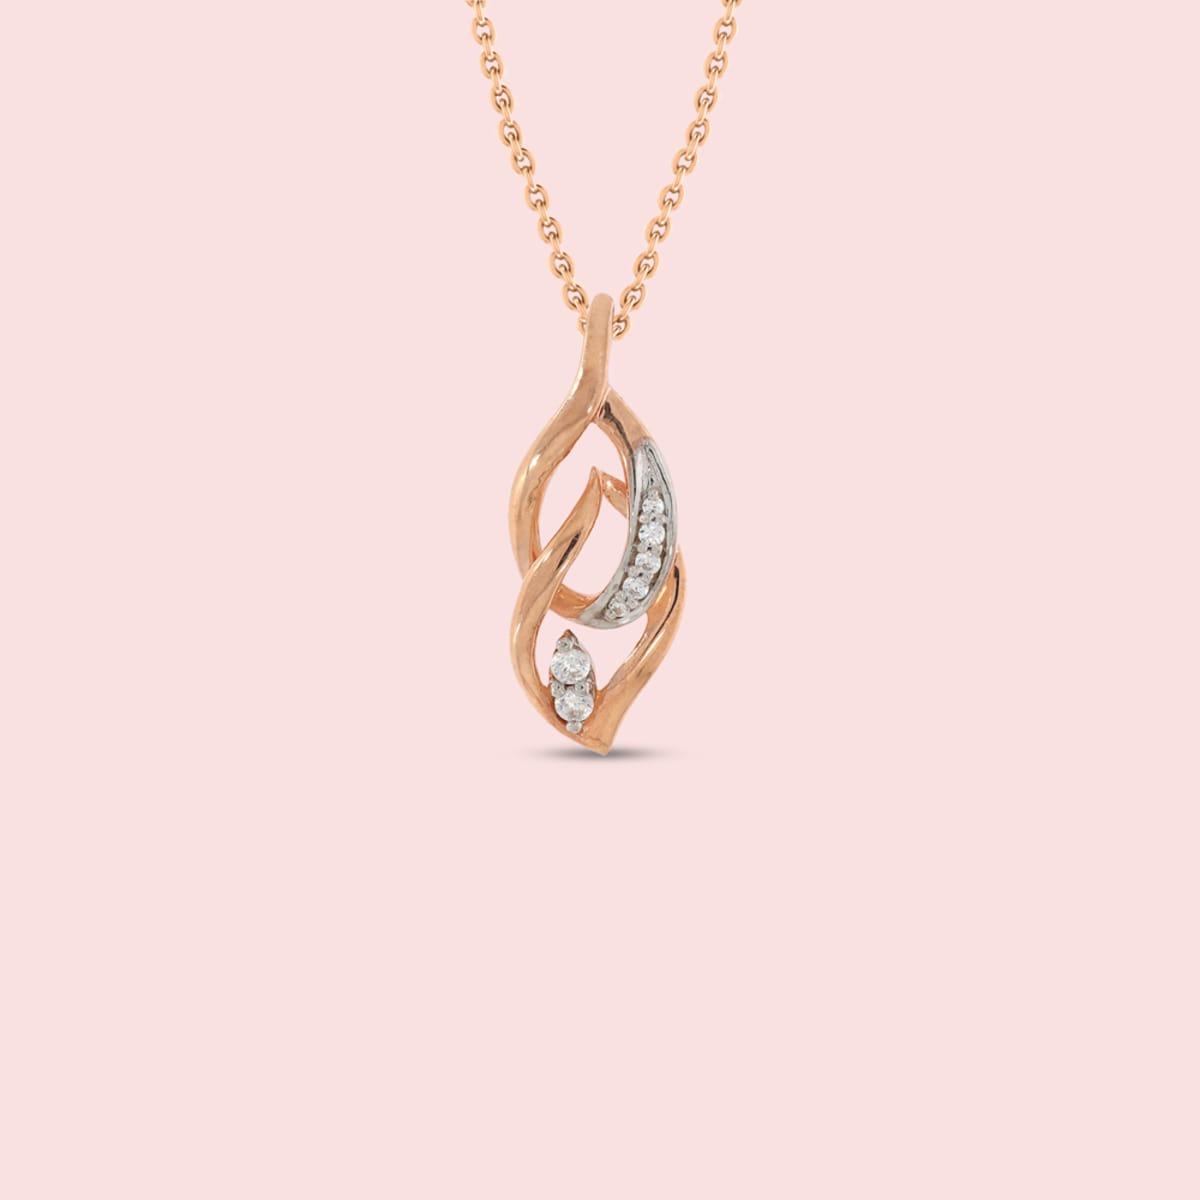 18kt Real Diamond Pendant